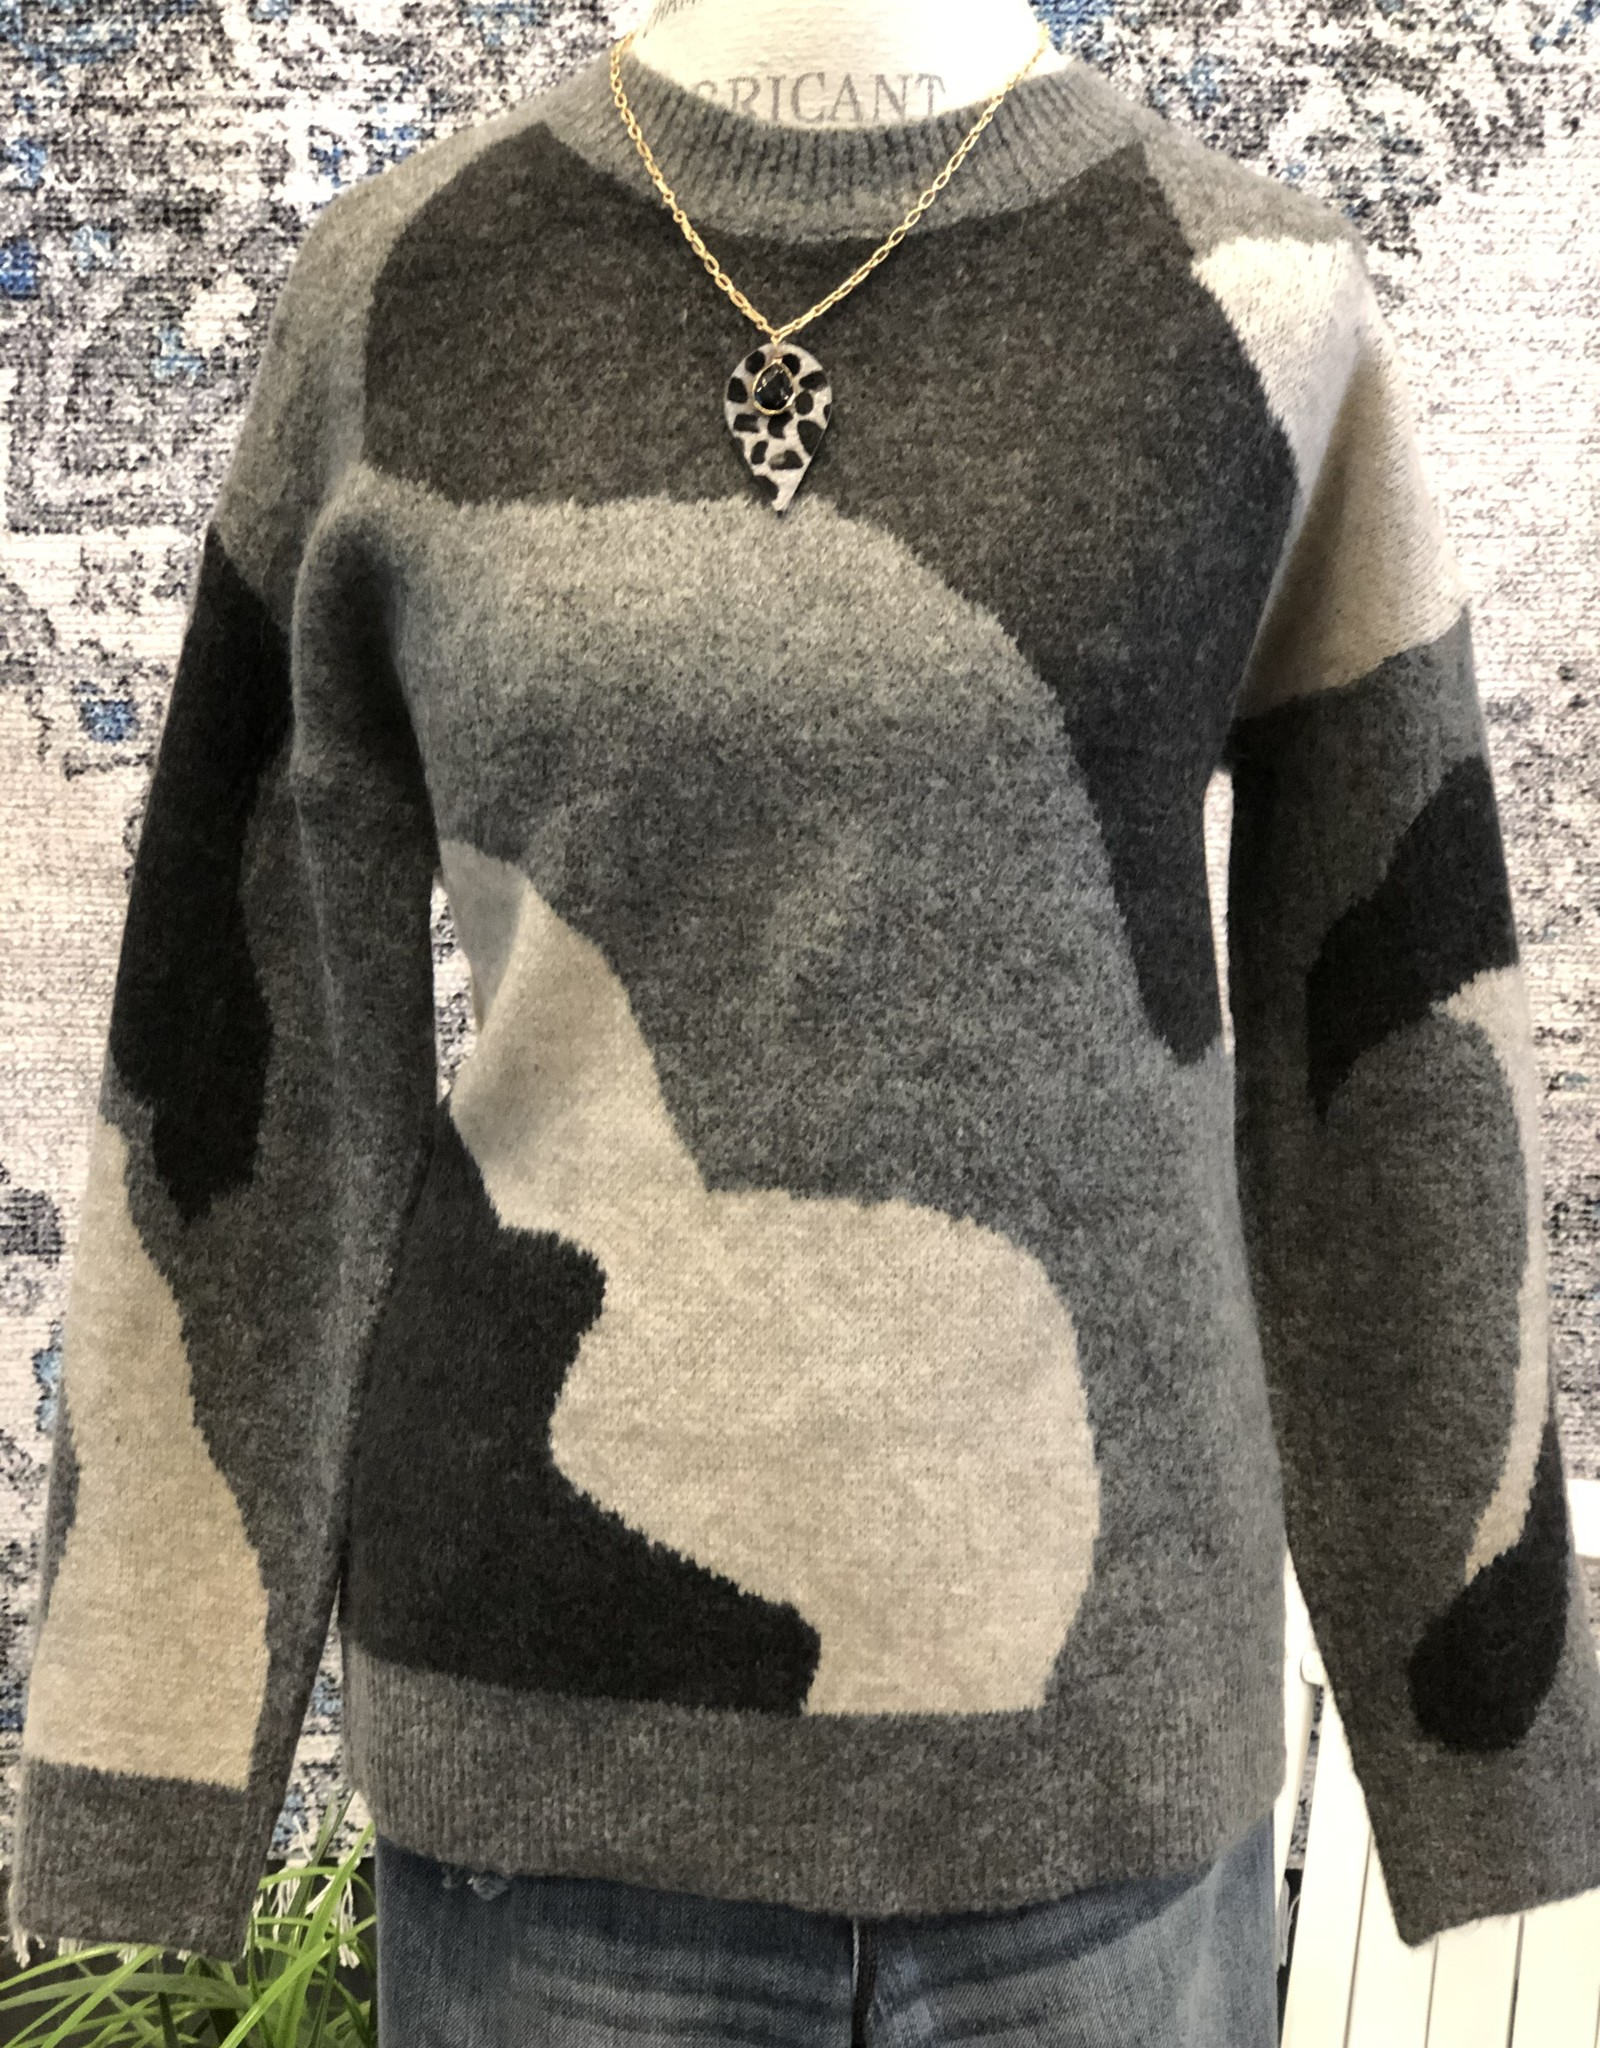 Mixed Grey Camo Sweater